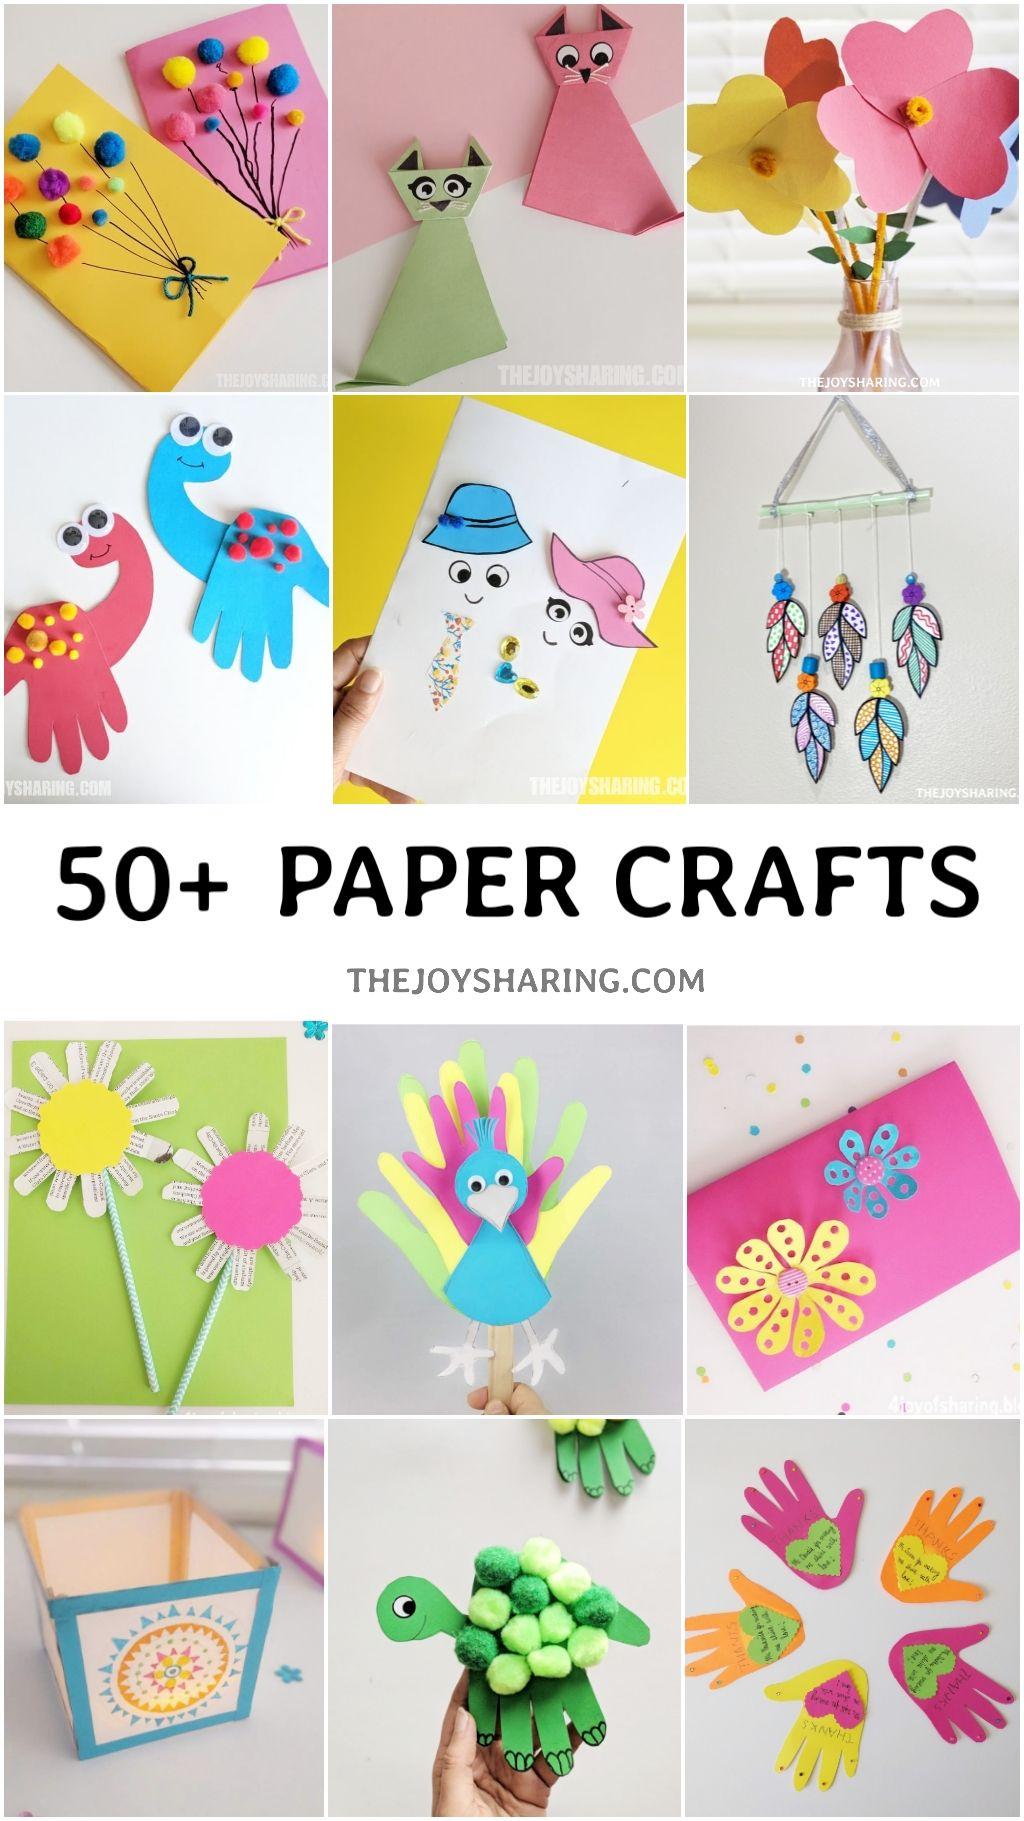 50 Paper Crafts For Kids In 2020 Paper Crafts For Kids Crafts